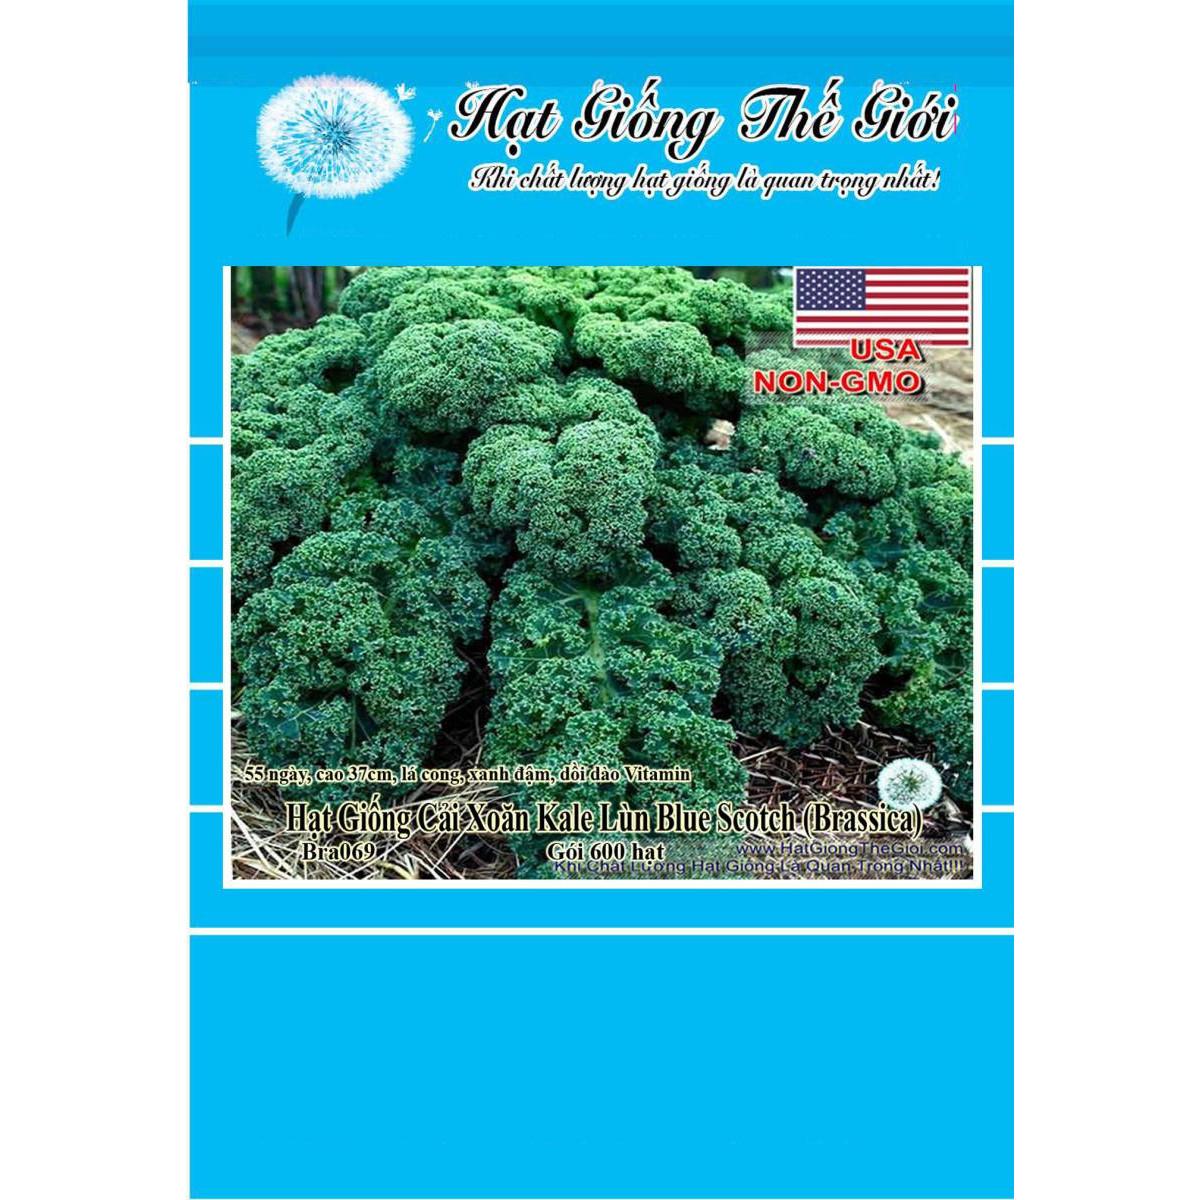 600h Hạt Giống Cải Xoăn Kale - Xoăn Lùn Blue Scotch (Brassica oleracea, Acephala)